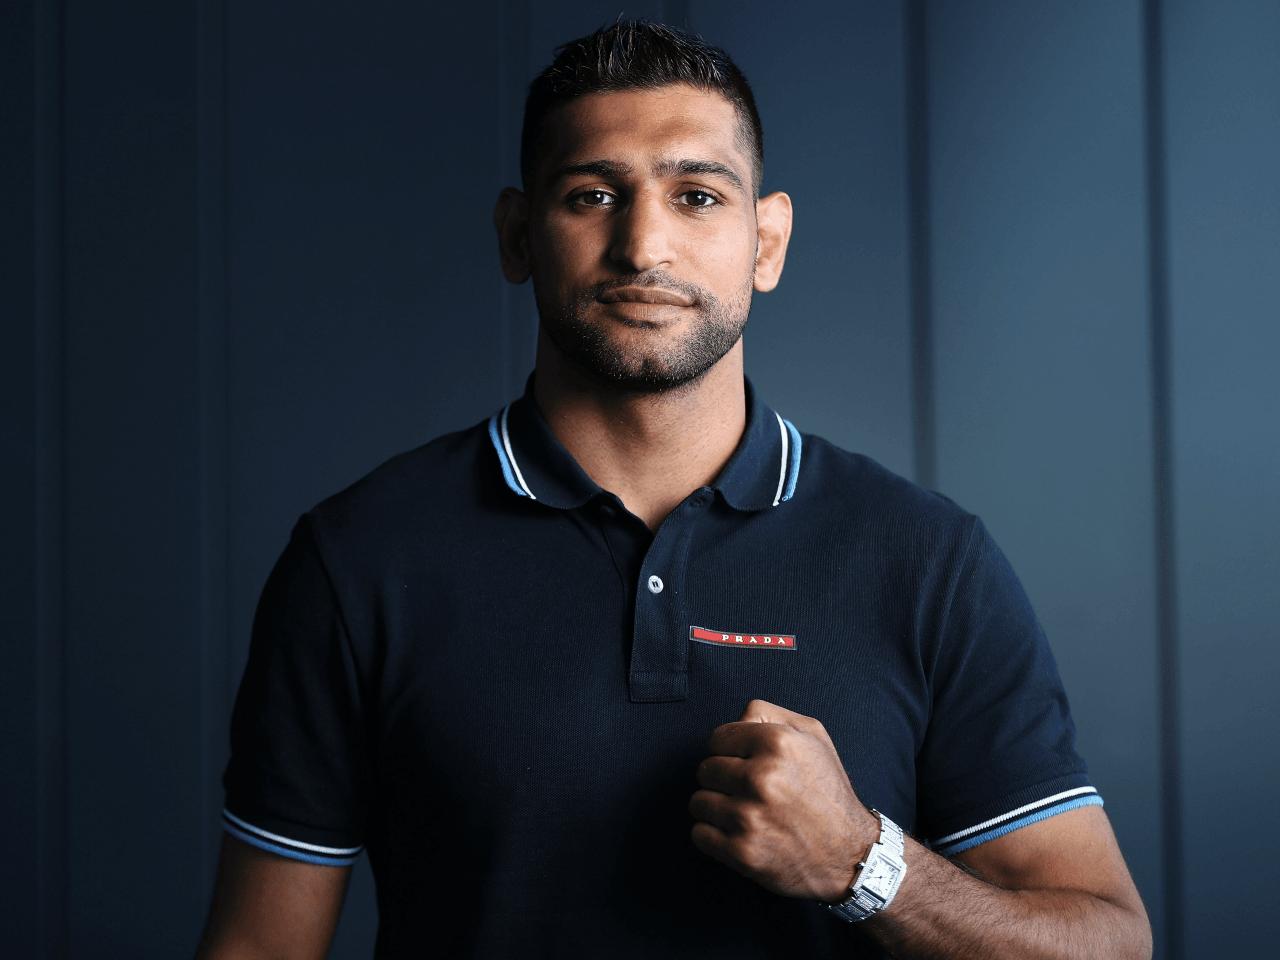 muslim boxer amir khan gets death threats for putting up